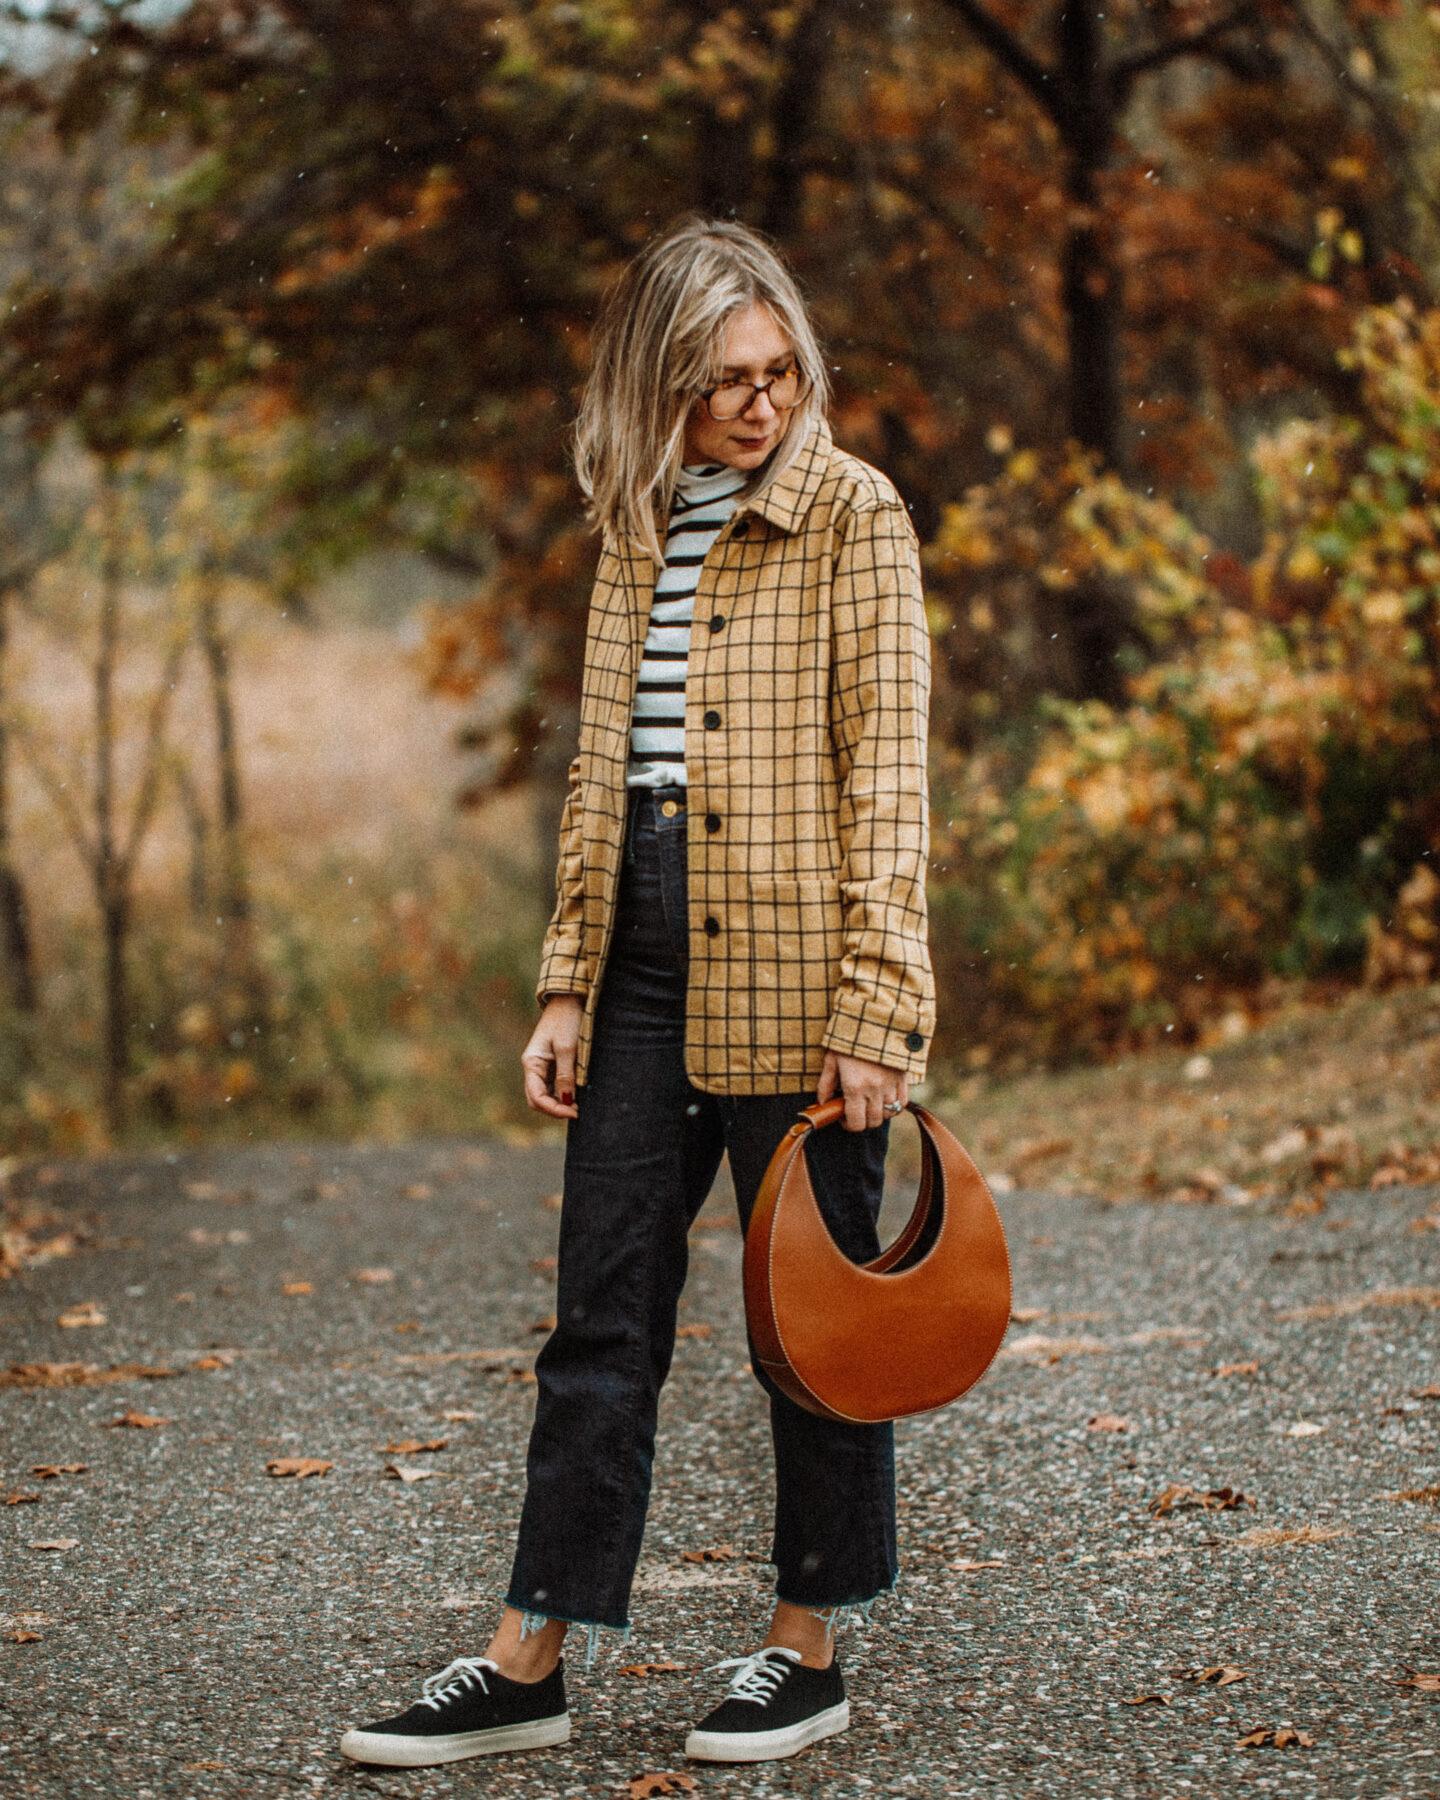 Tradlands Cozy Pieces Review, Monty Striped Turtleneck, Field Chore Coat Mesa